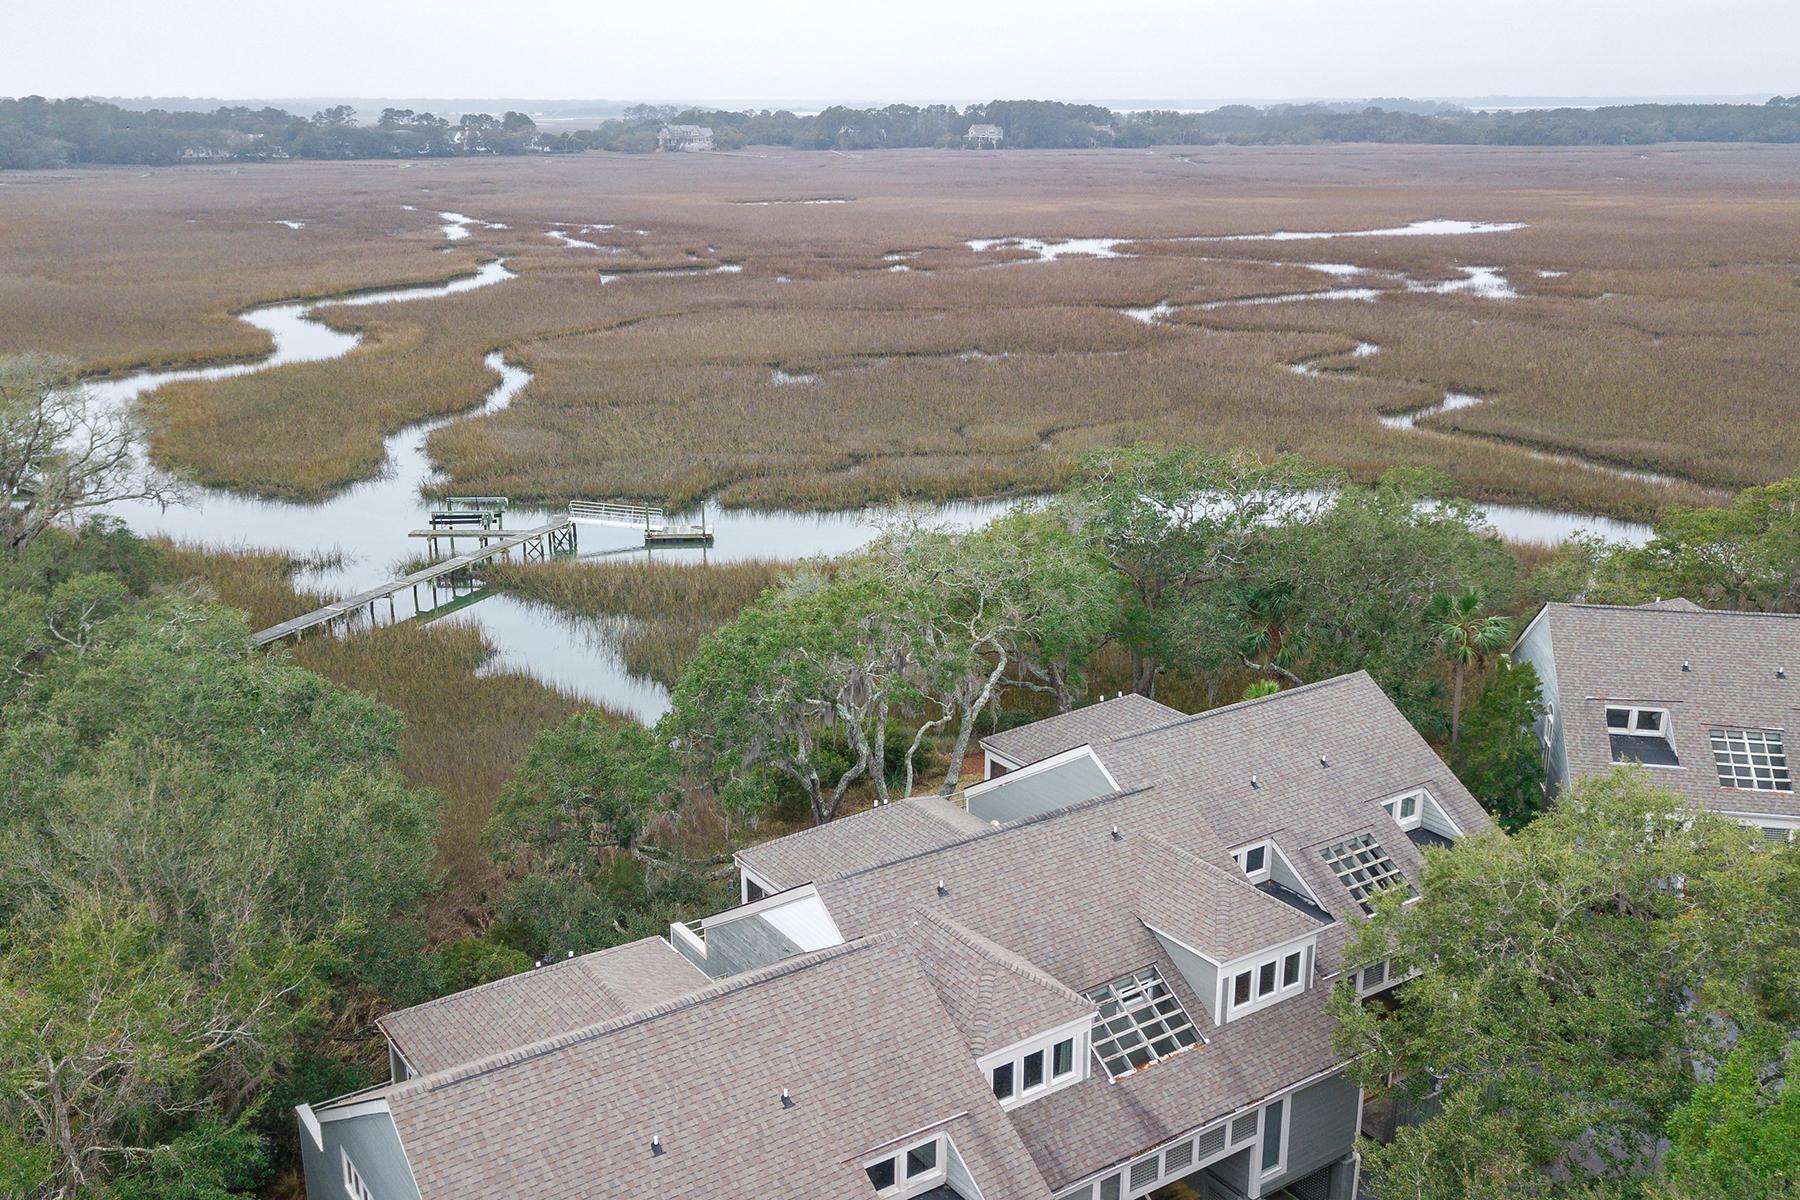 Single Family Home for Sale at 1701 Live Oak Park Seabrook Island, South Carolina, 29455 United States